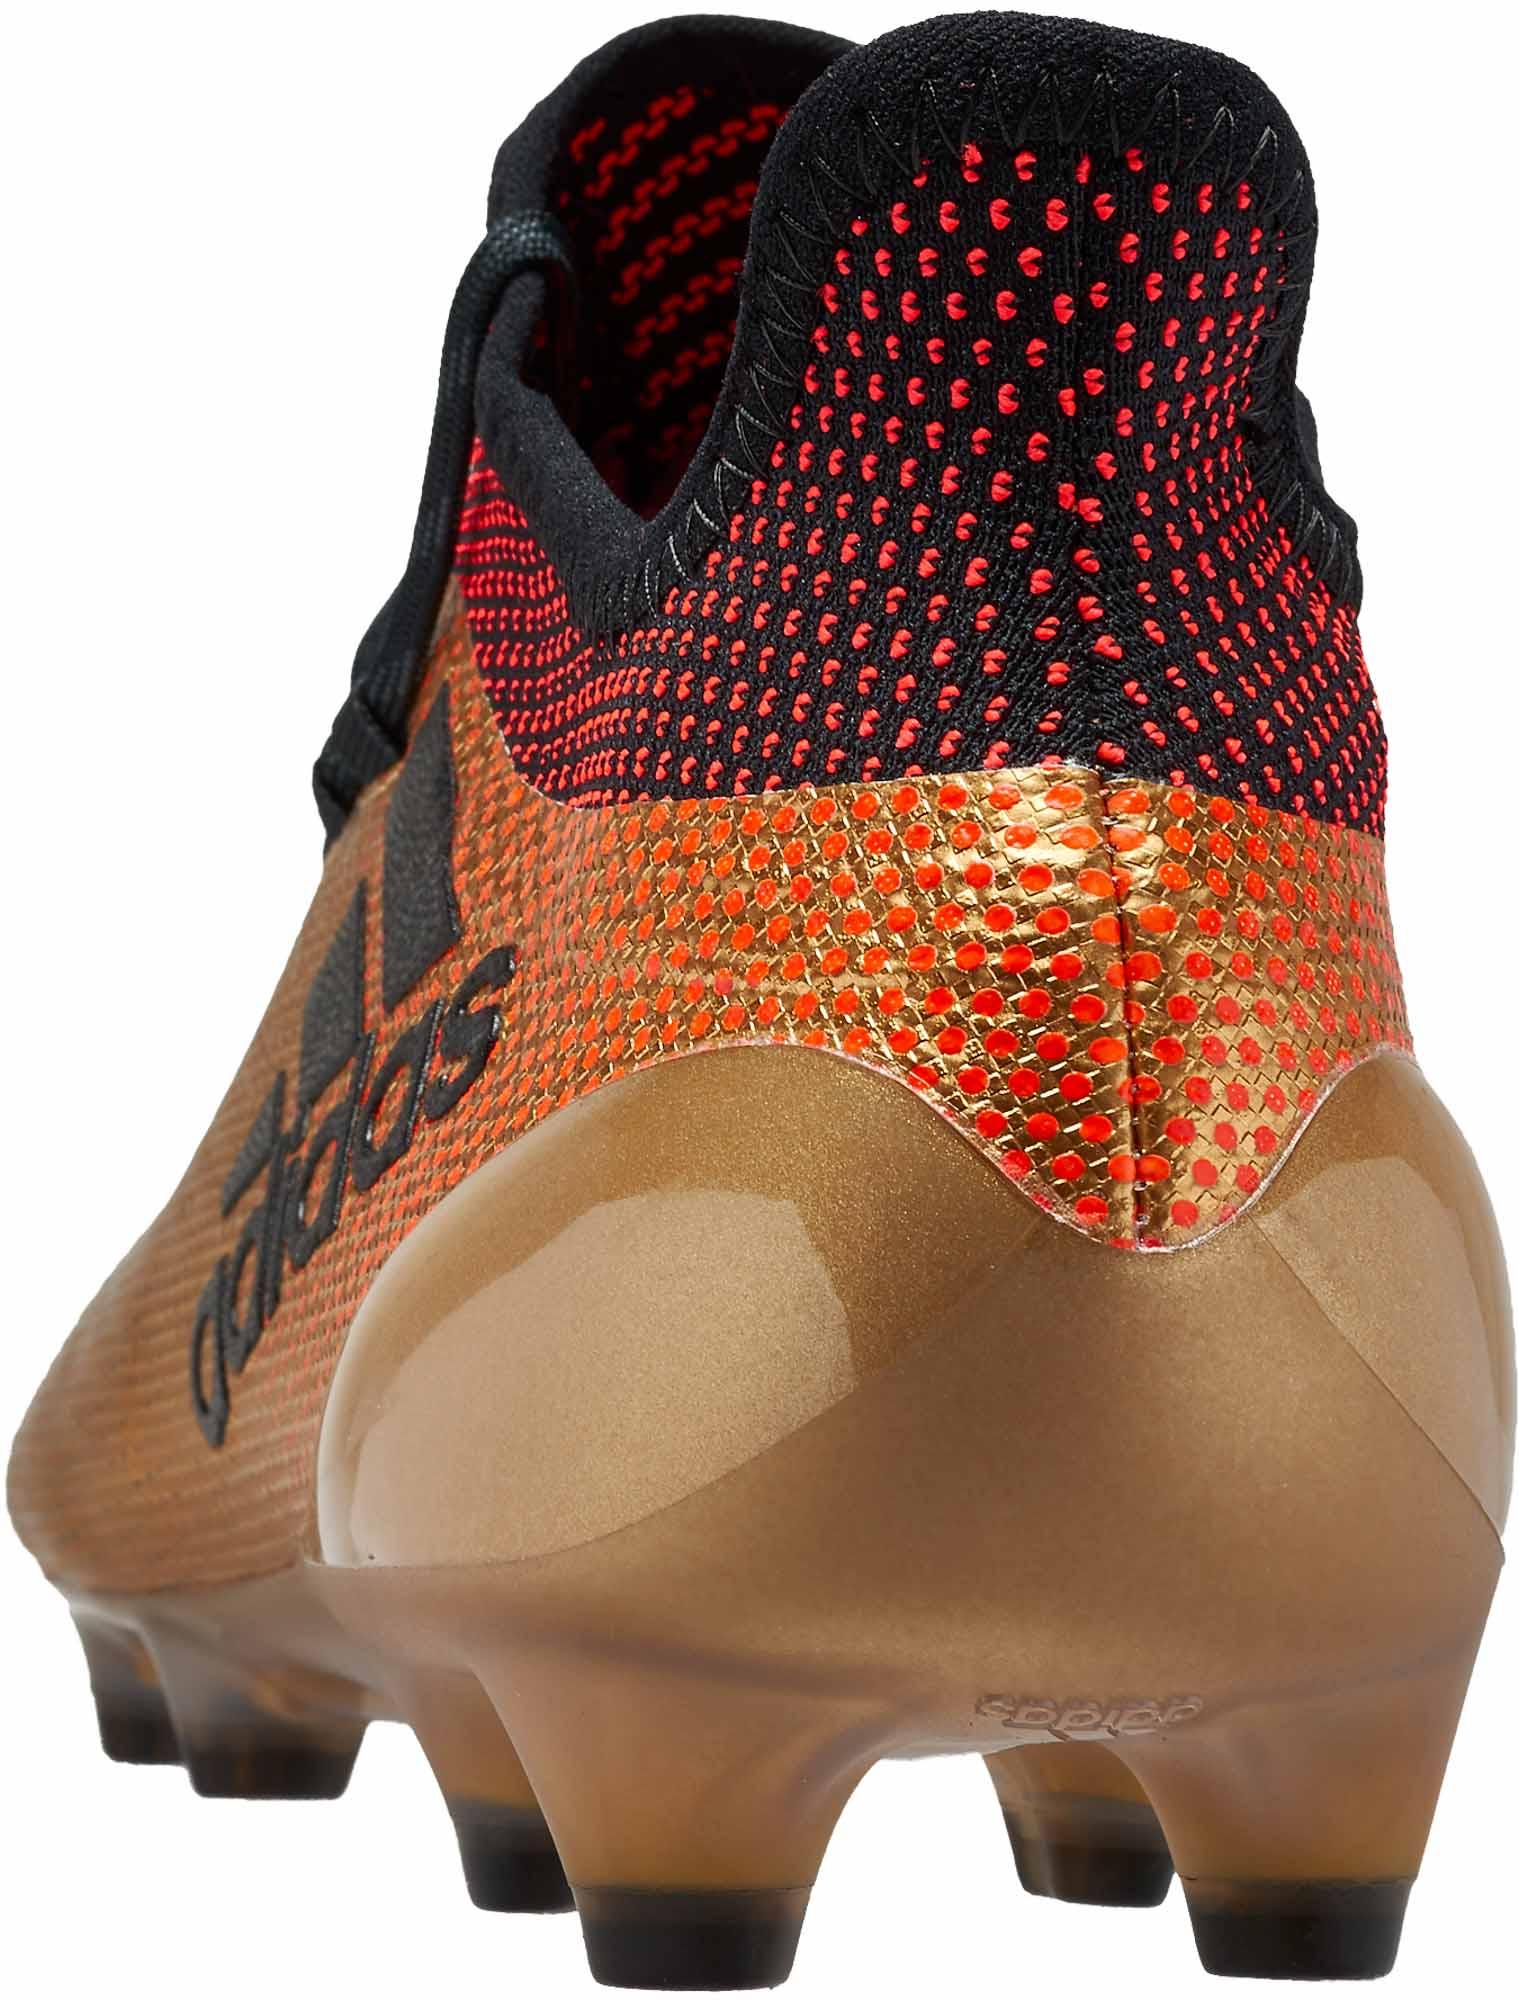 683340937a33 adidas X 17.1 FG - Tactile Gold Metallic & Solar Red - Soccer Master